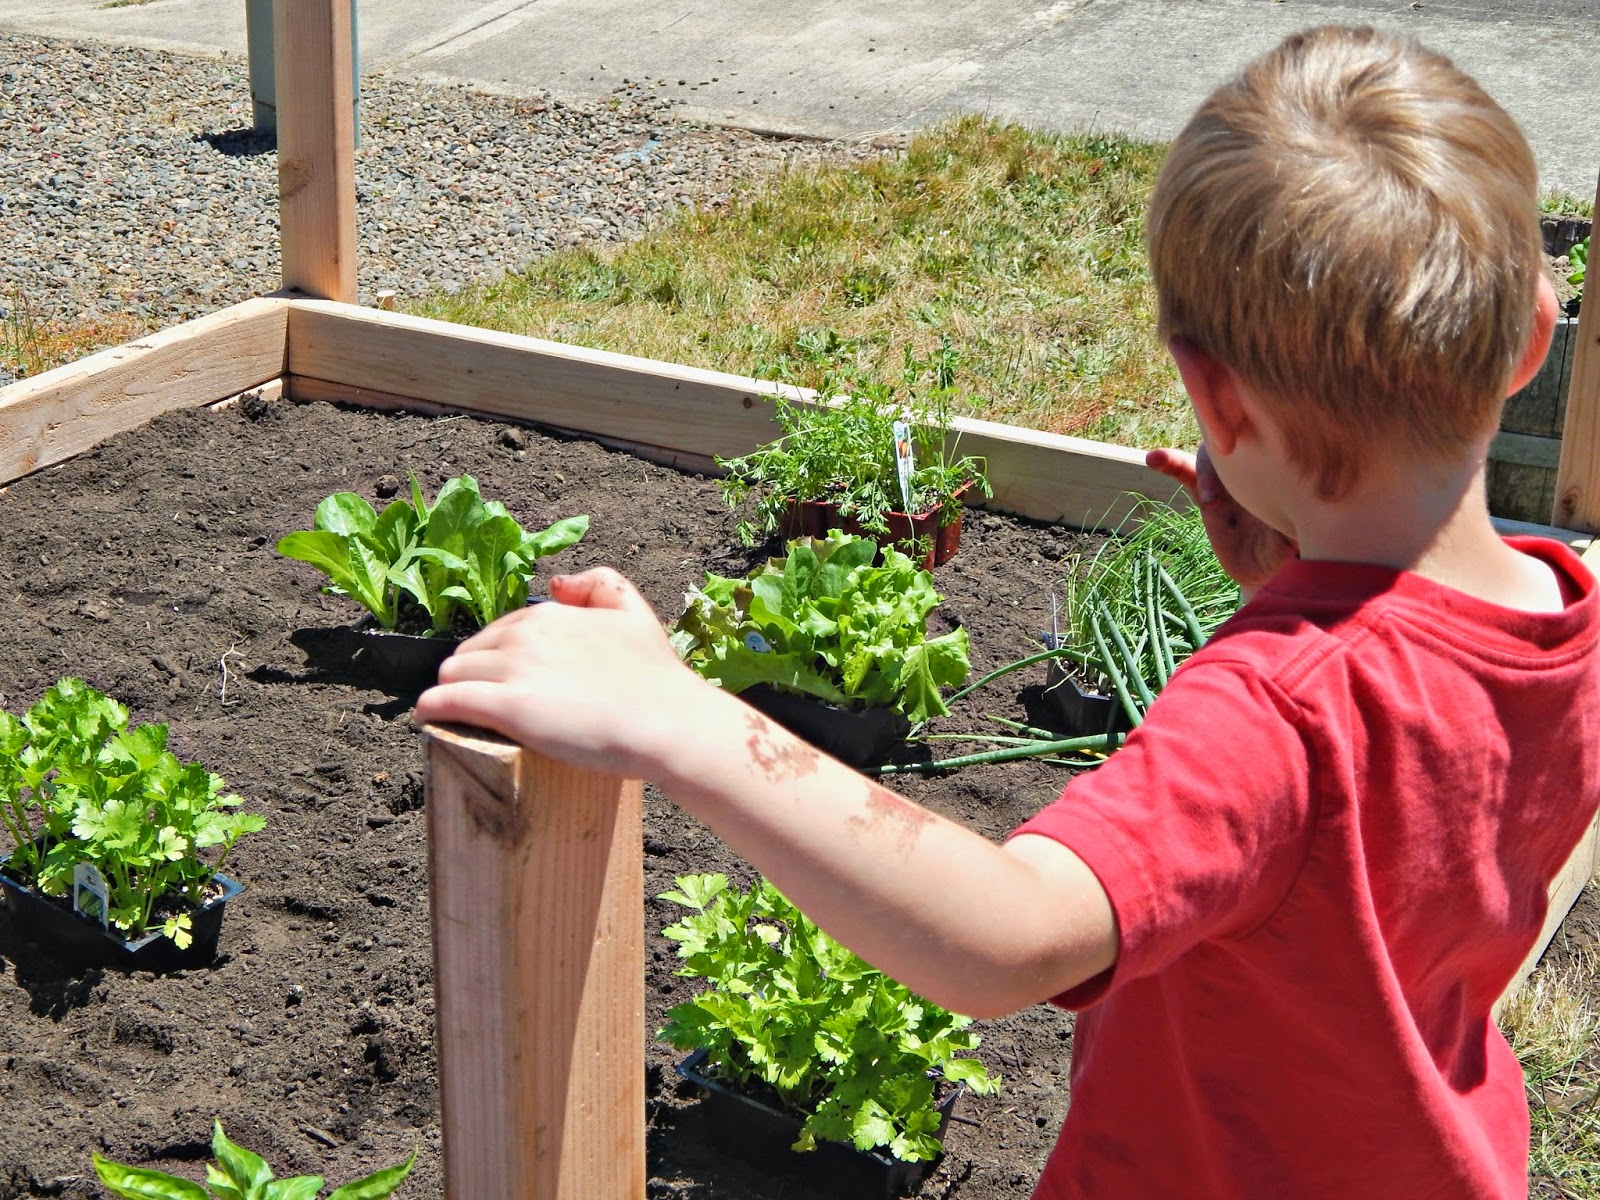 How to Build a Raised Garden #FreshNaturally #Shop #Cbias